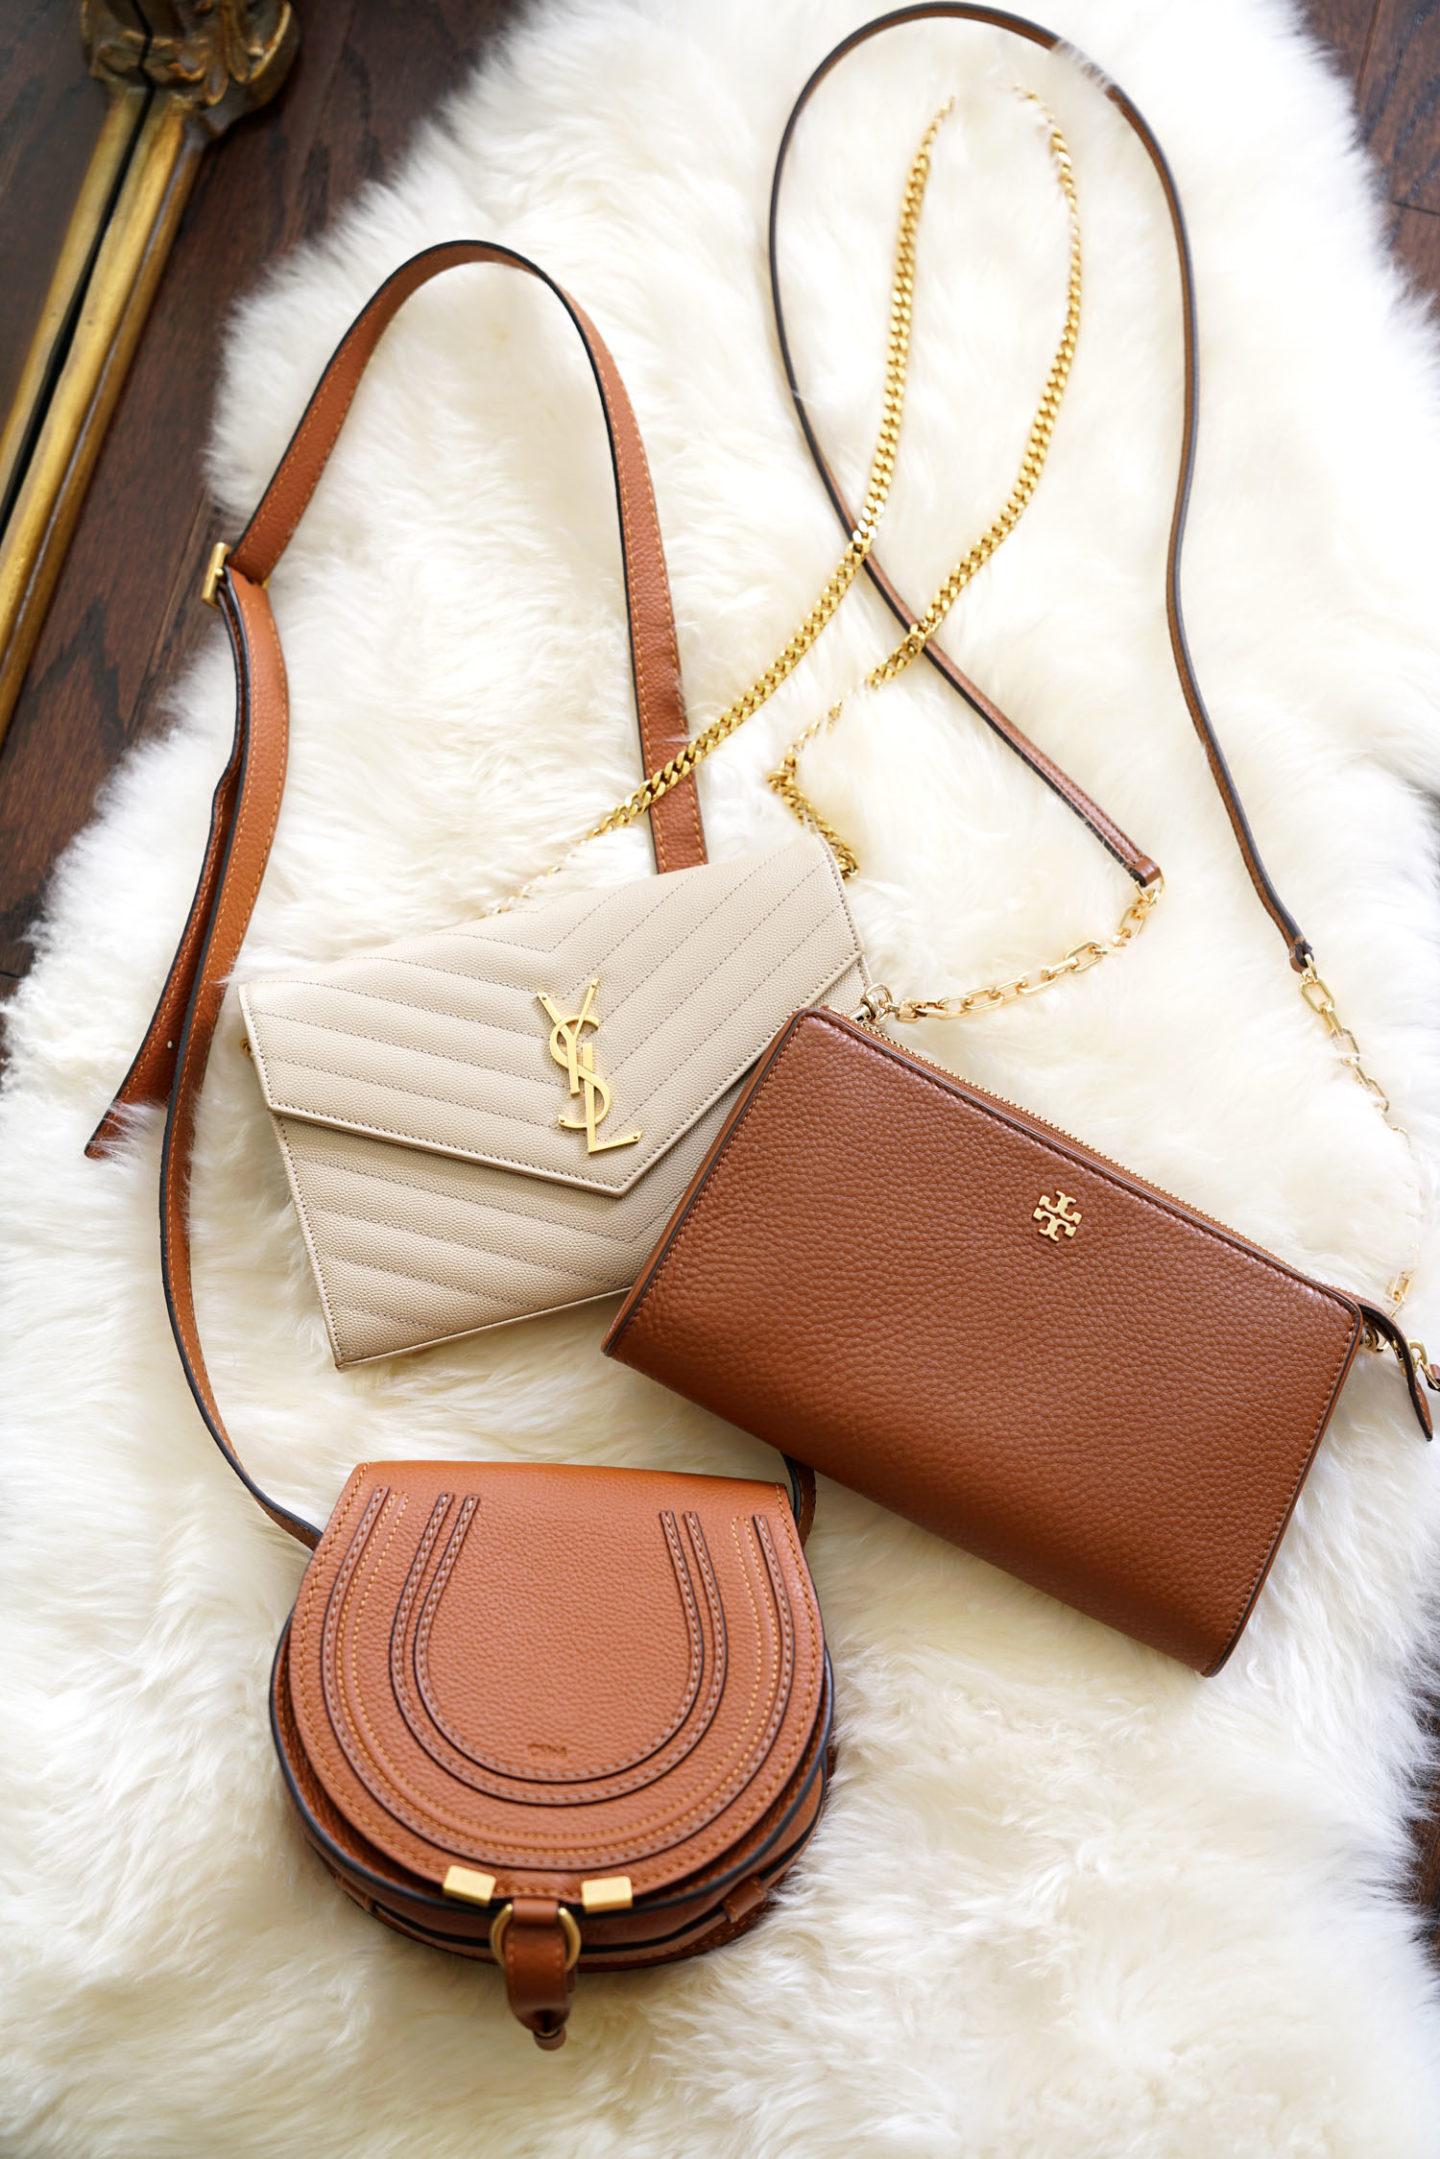 Small Crossbody Bags: Chloe Mini Marcie, YSL Wallet on Chain, Tory Burch Marsden